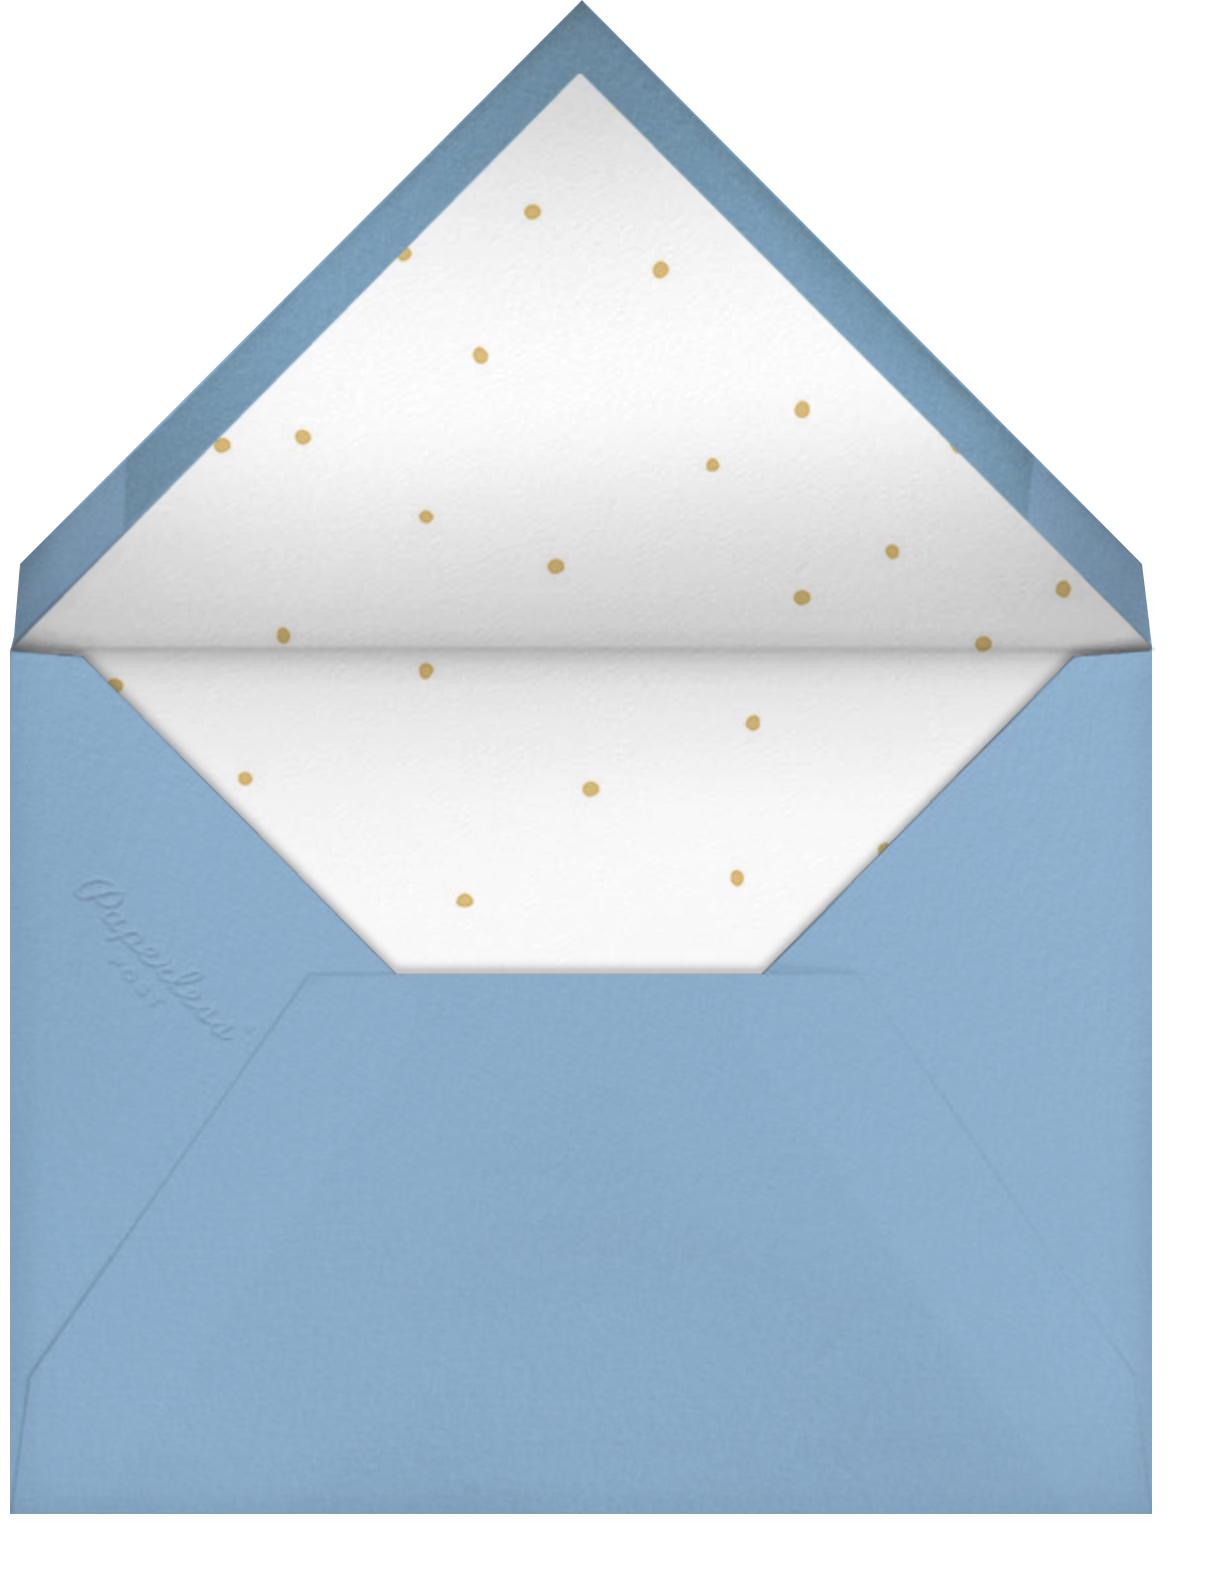 Capitalized - Sugar Paper - Envelope